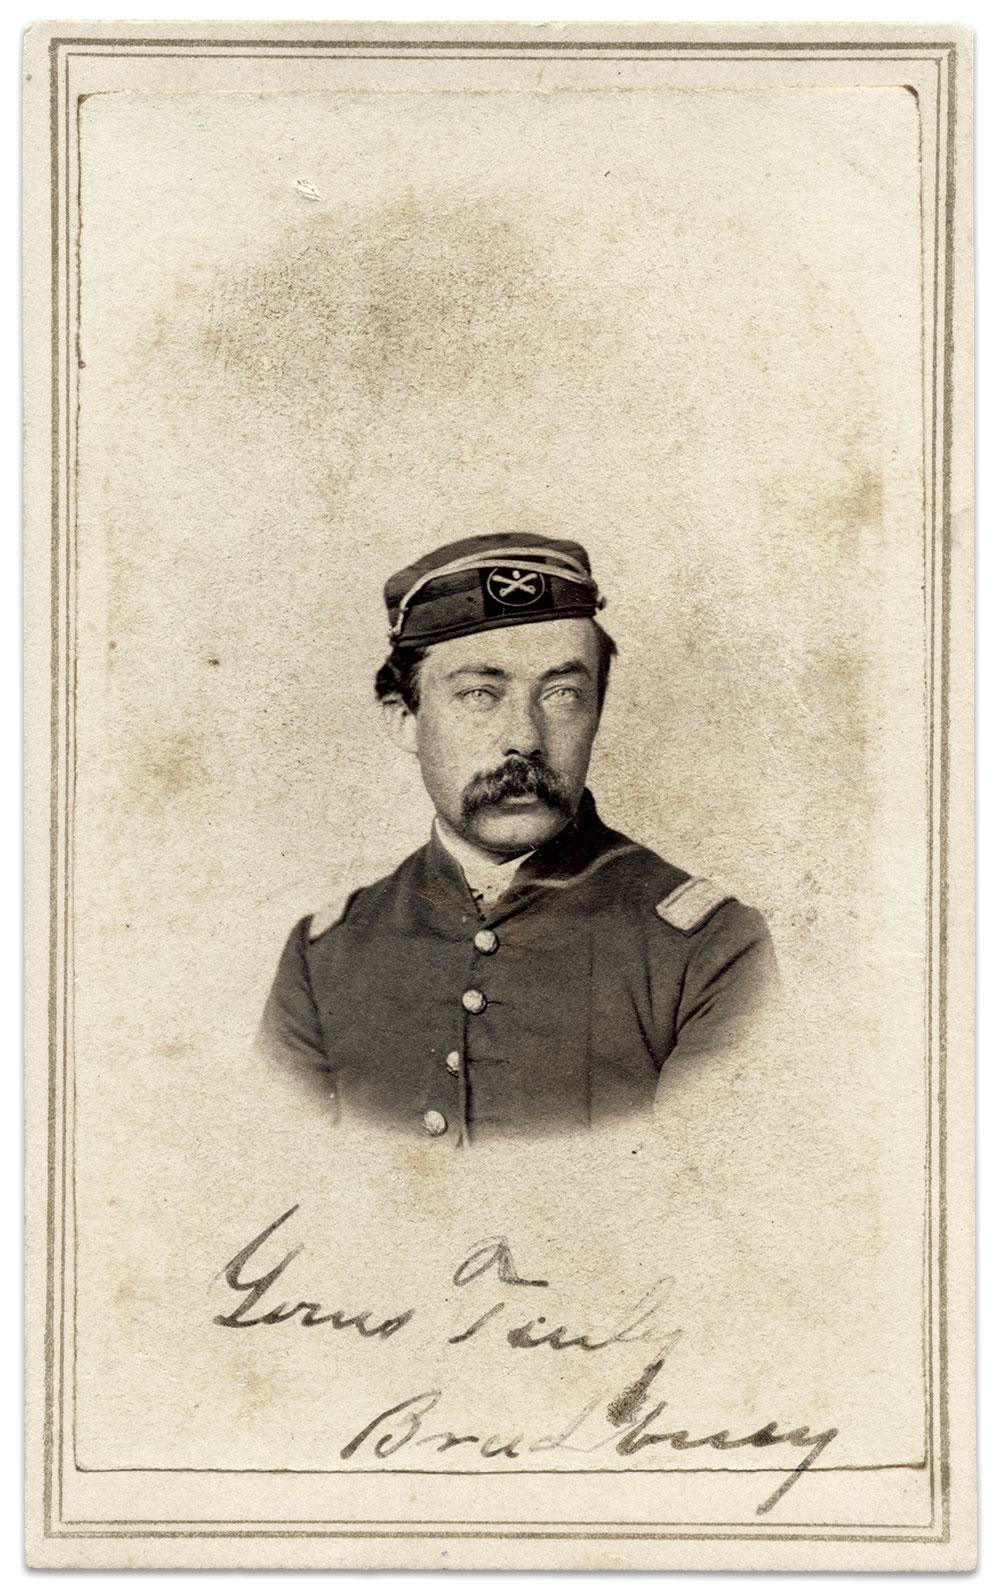 Sanford D. Bradbury as a lieutenant in the 6th U.S. Colored Cavalry. Carte de visite by Paige & Mills of Washington, D.C. Jim Quinlan Collection.